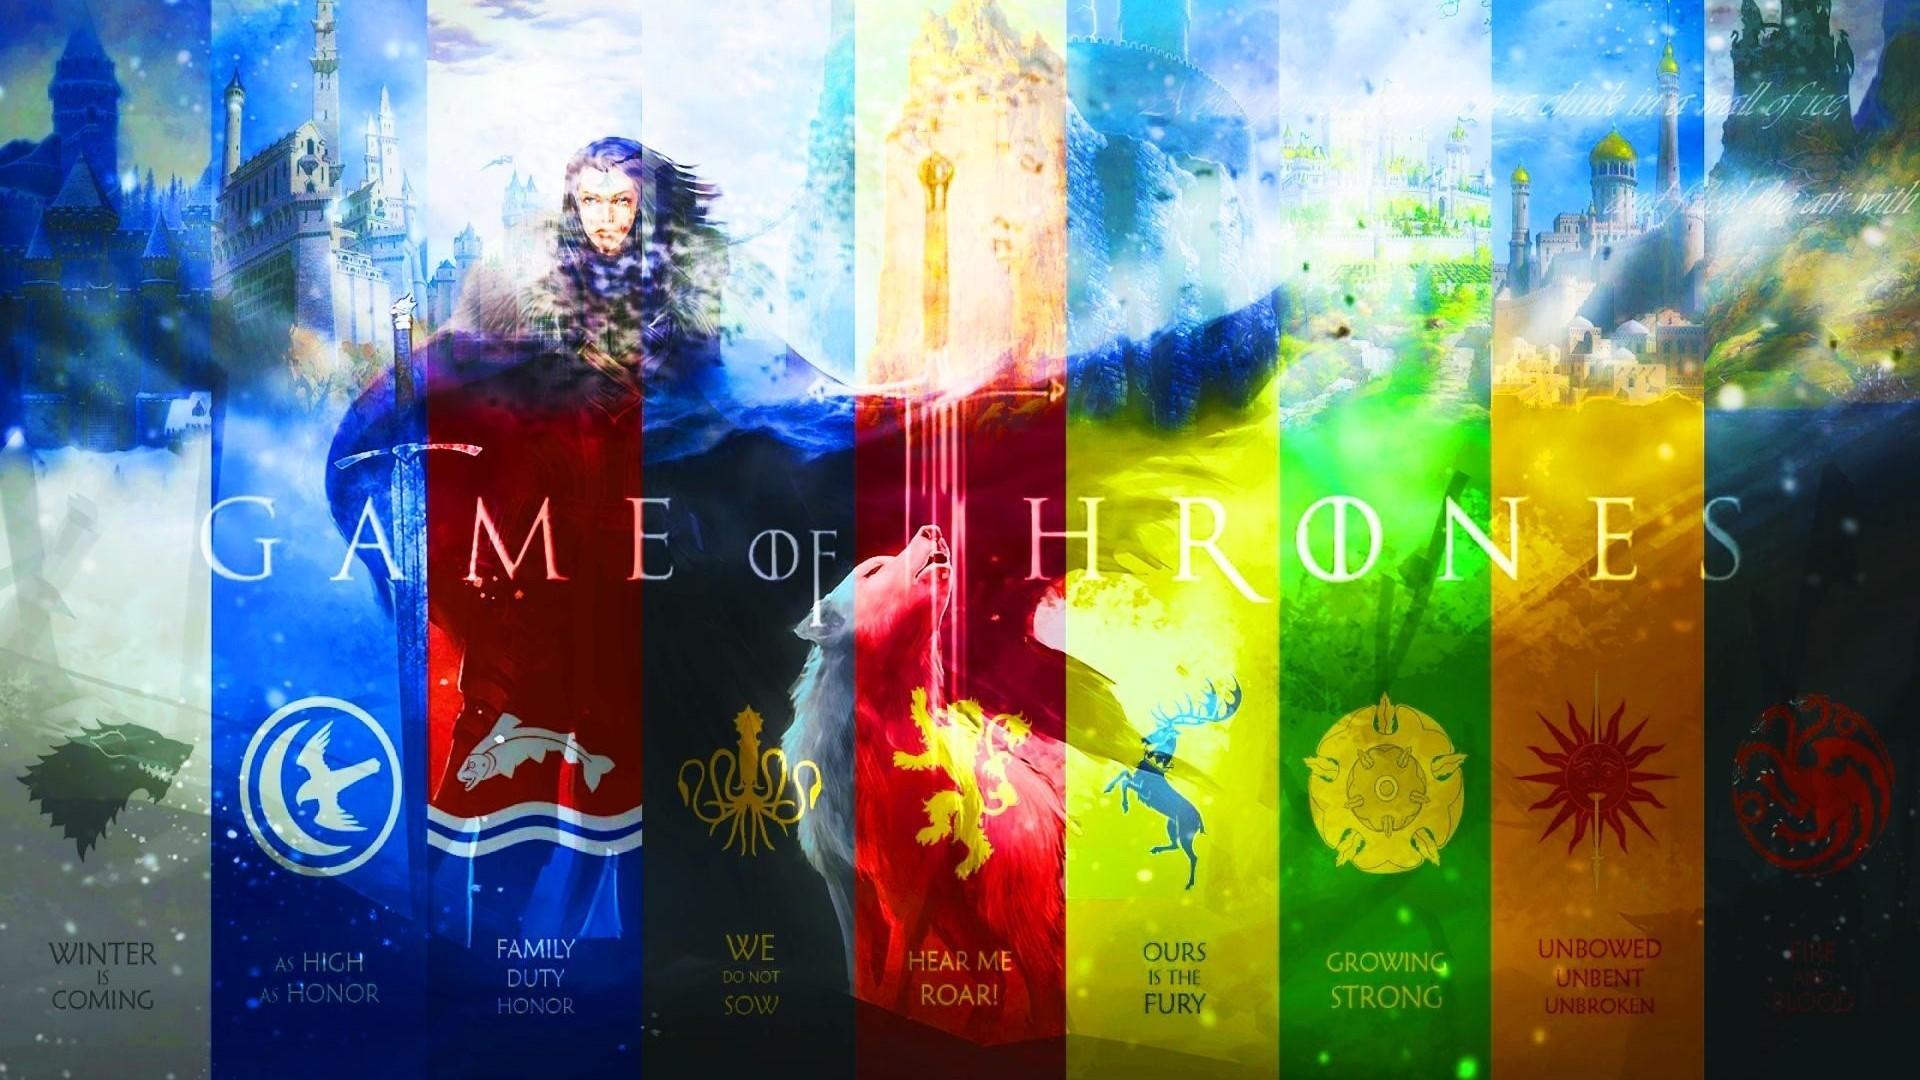 Cool Game Of Thrones Wallpaper-81w5lu2 - Desktop Backgrounds Game Of Thrones Wallpaper Hd - HD Wallpaper